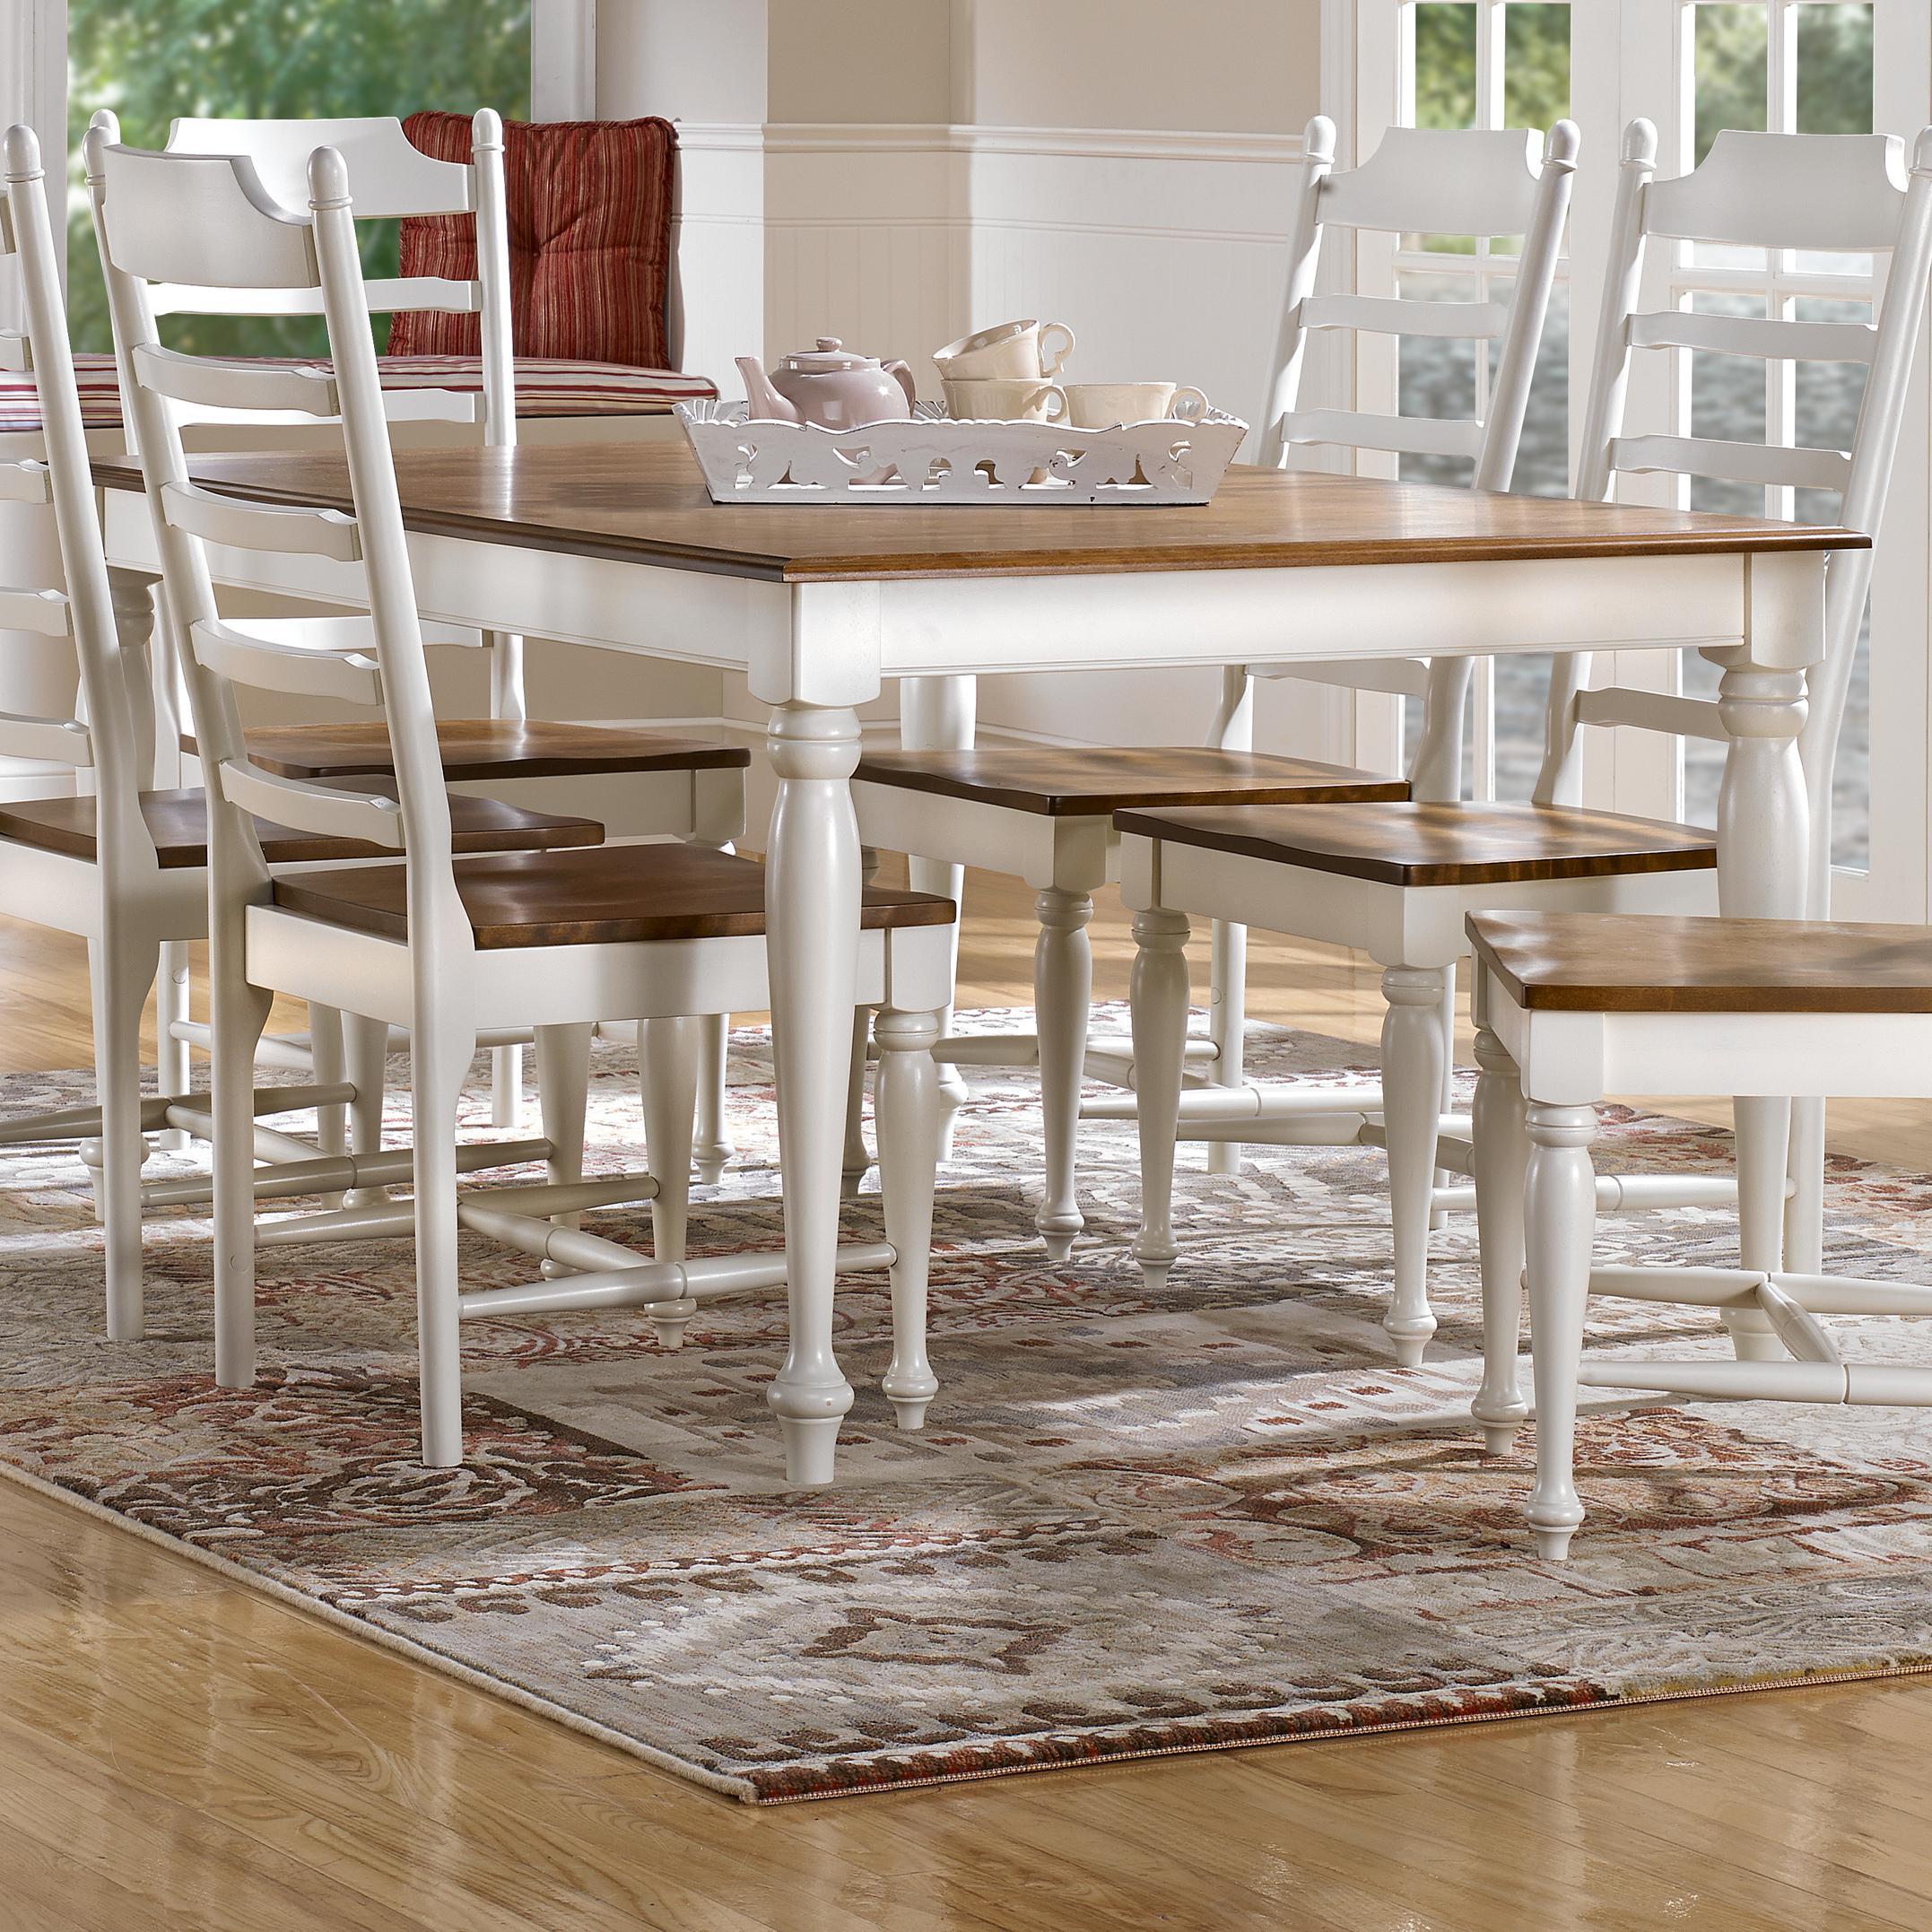 canadel gourmet custom dining customizable rectangular table belfort furniture kitchen tables. Black Bedroom Furniture Sets. Home Design Ideas